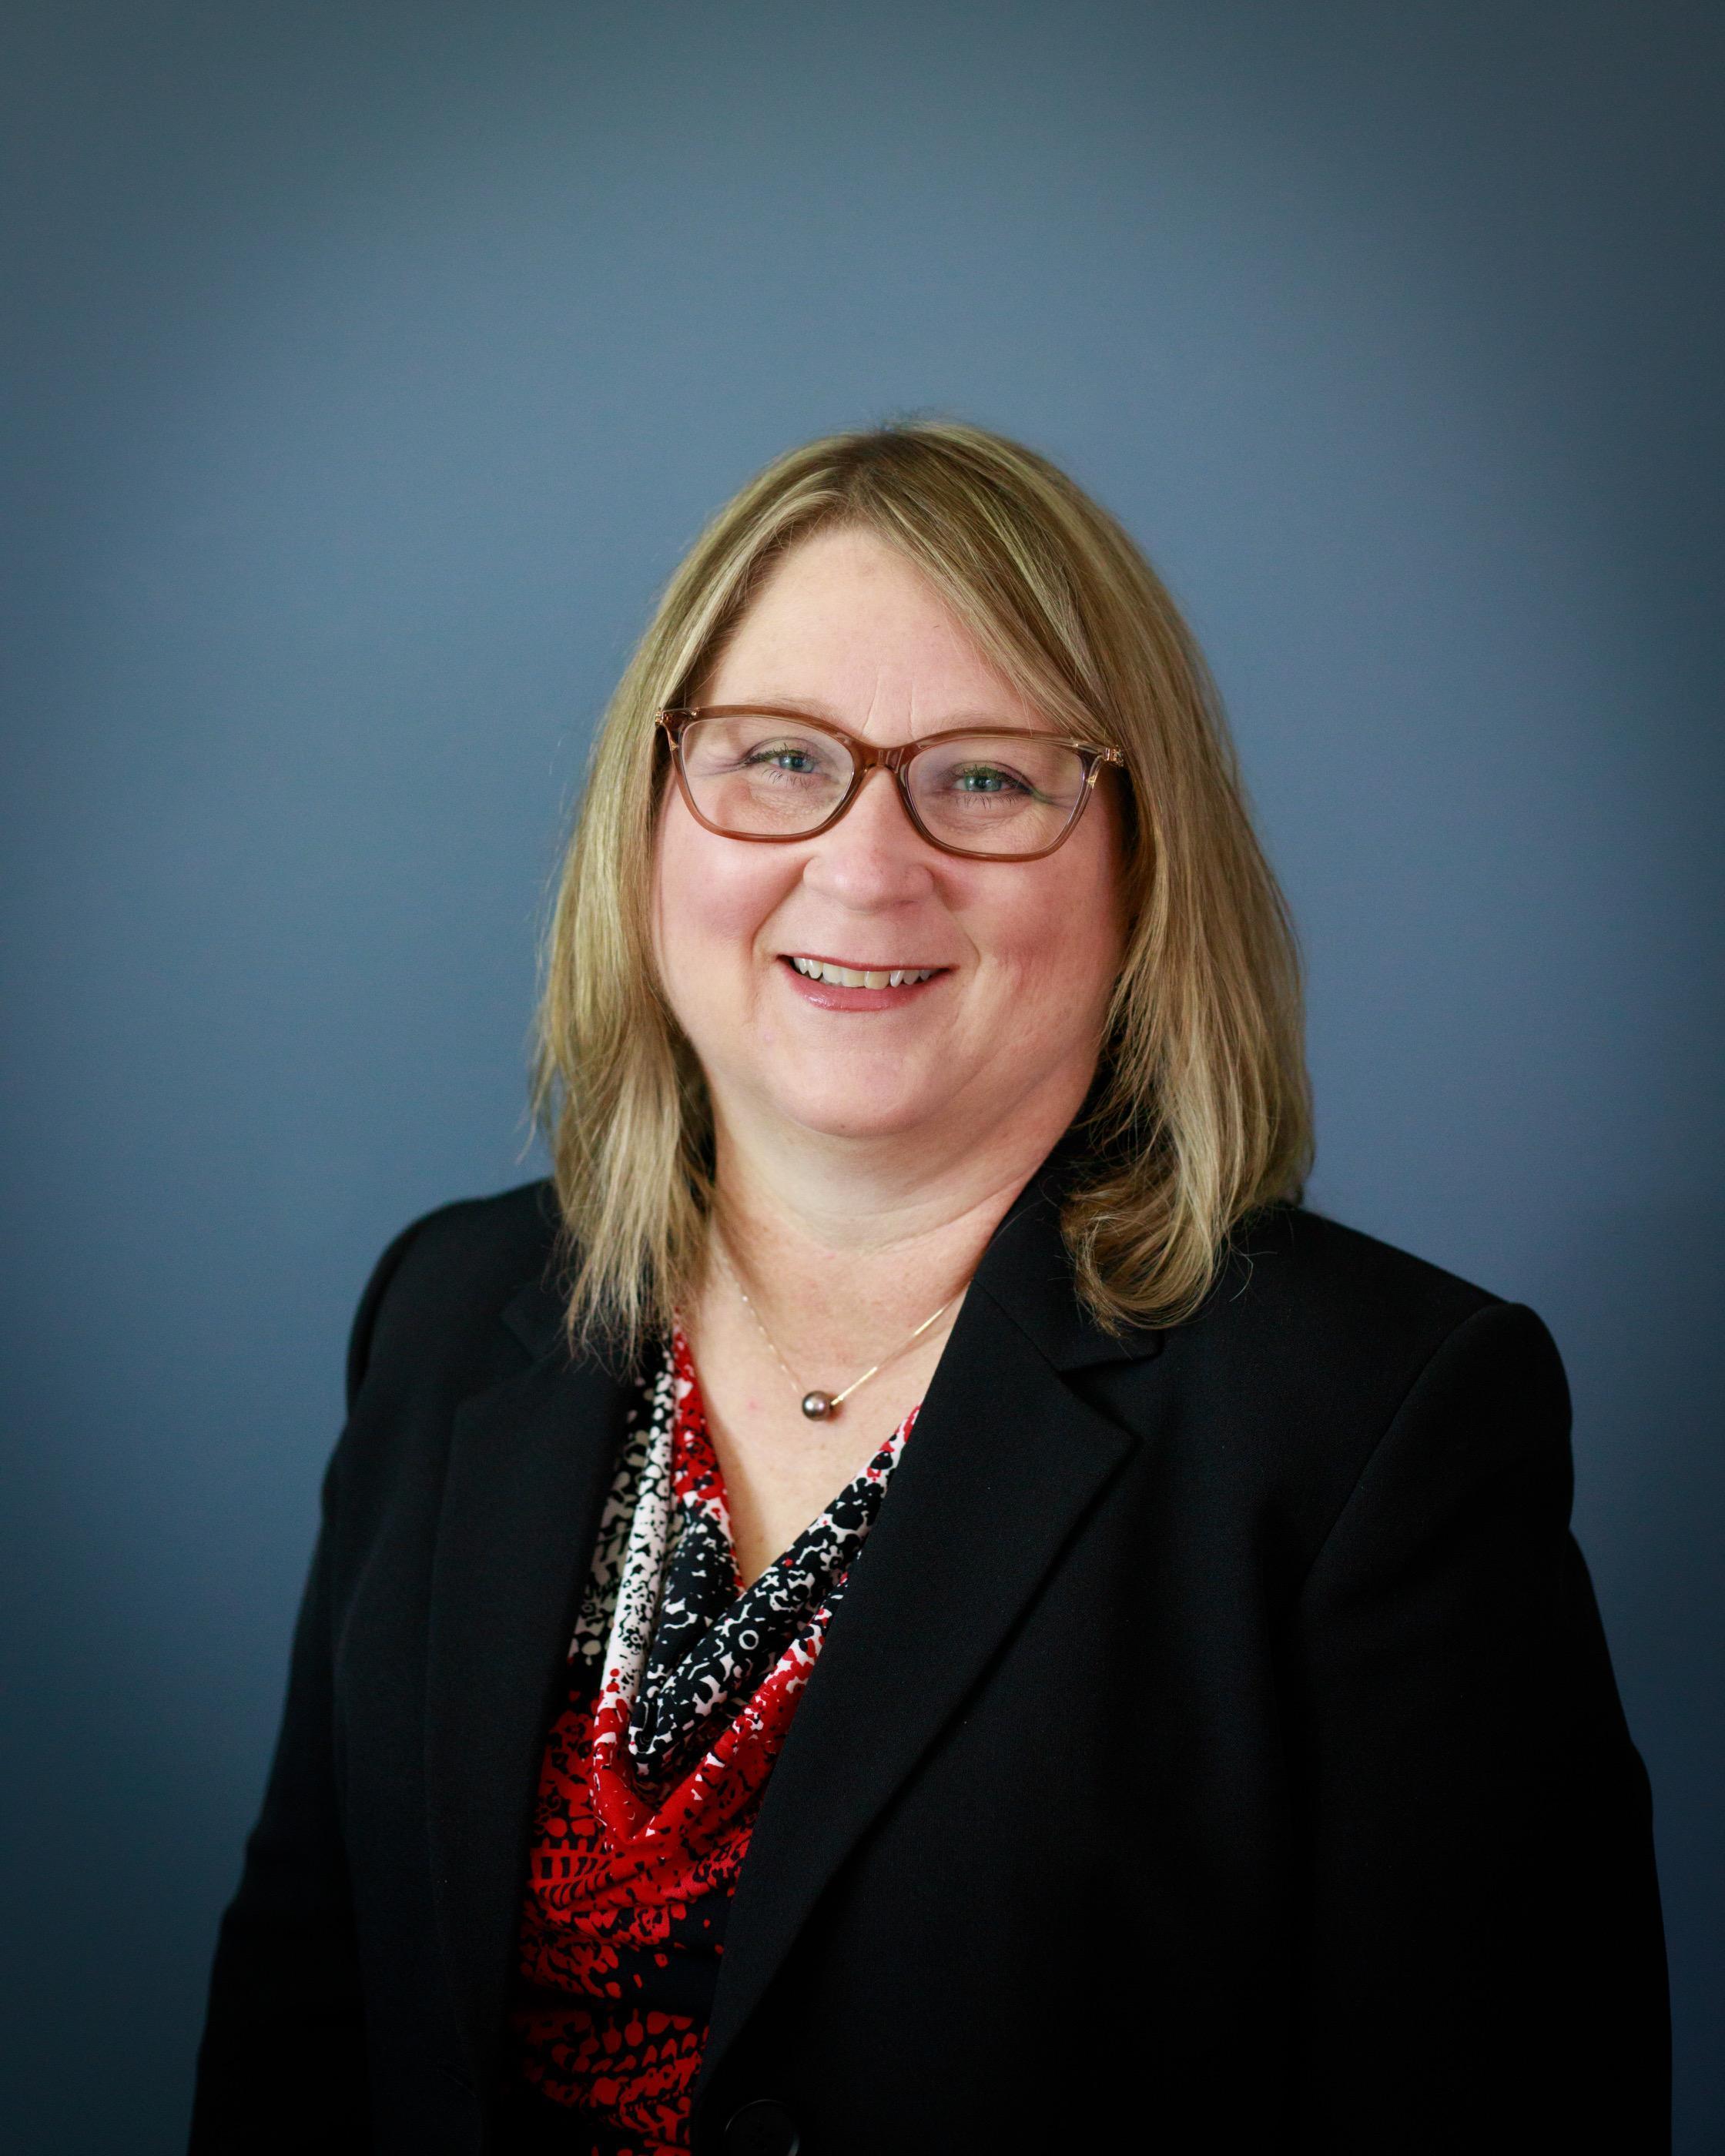 Dr. Valerie Hawkins, Superintendent